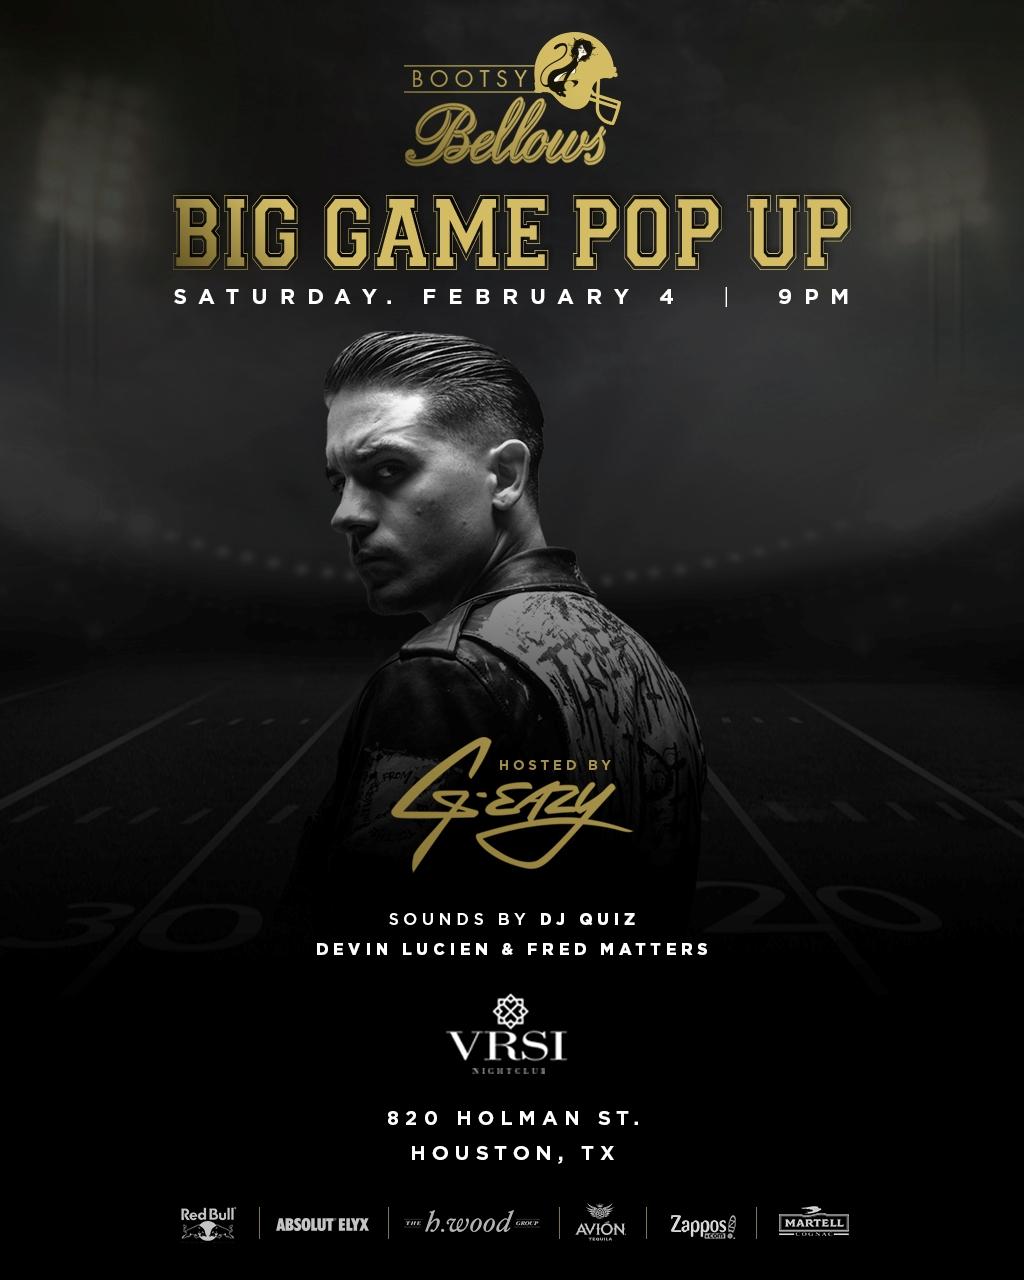 G Eazy Super Bow Party Houston 2017 VRSI Bootsy Bellows